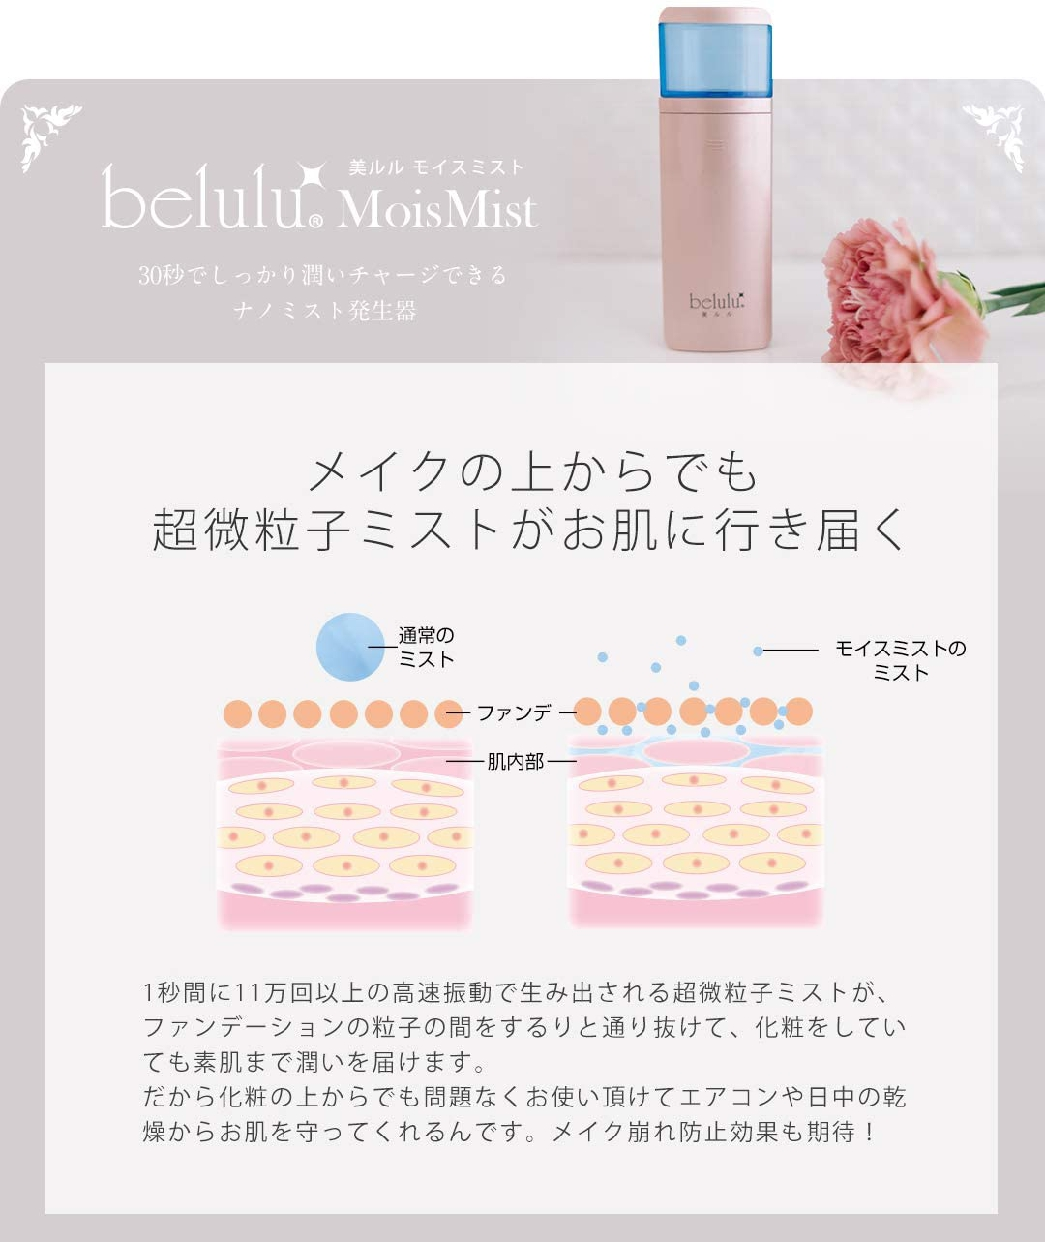 belulu(びるる)美ルル モイスミスト KRD-1028の商品画像4